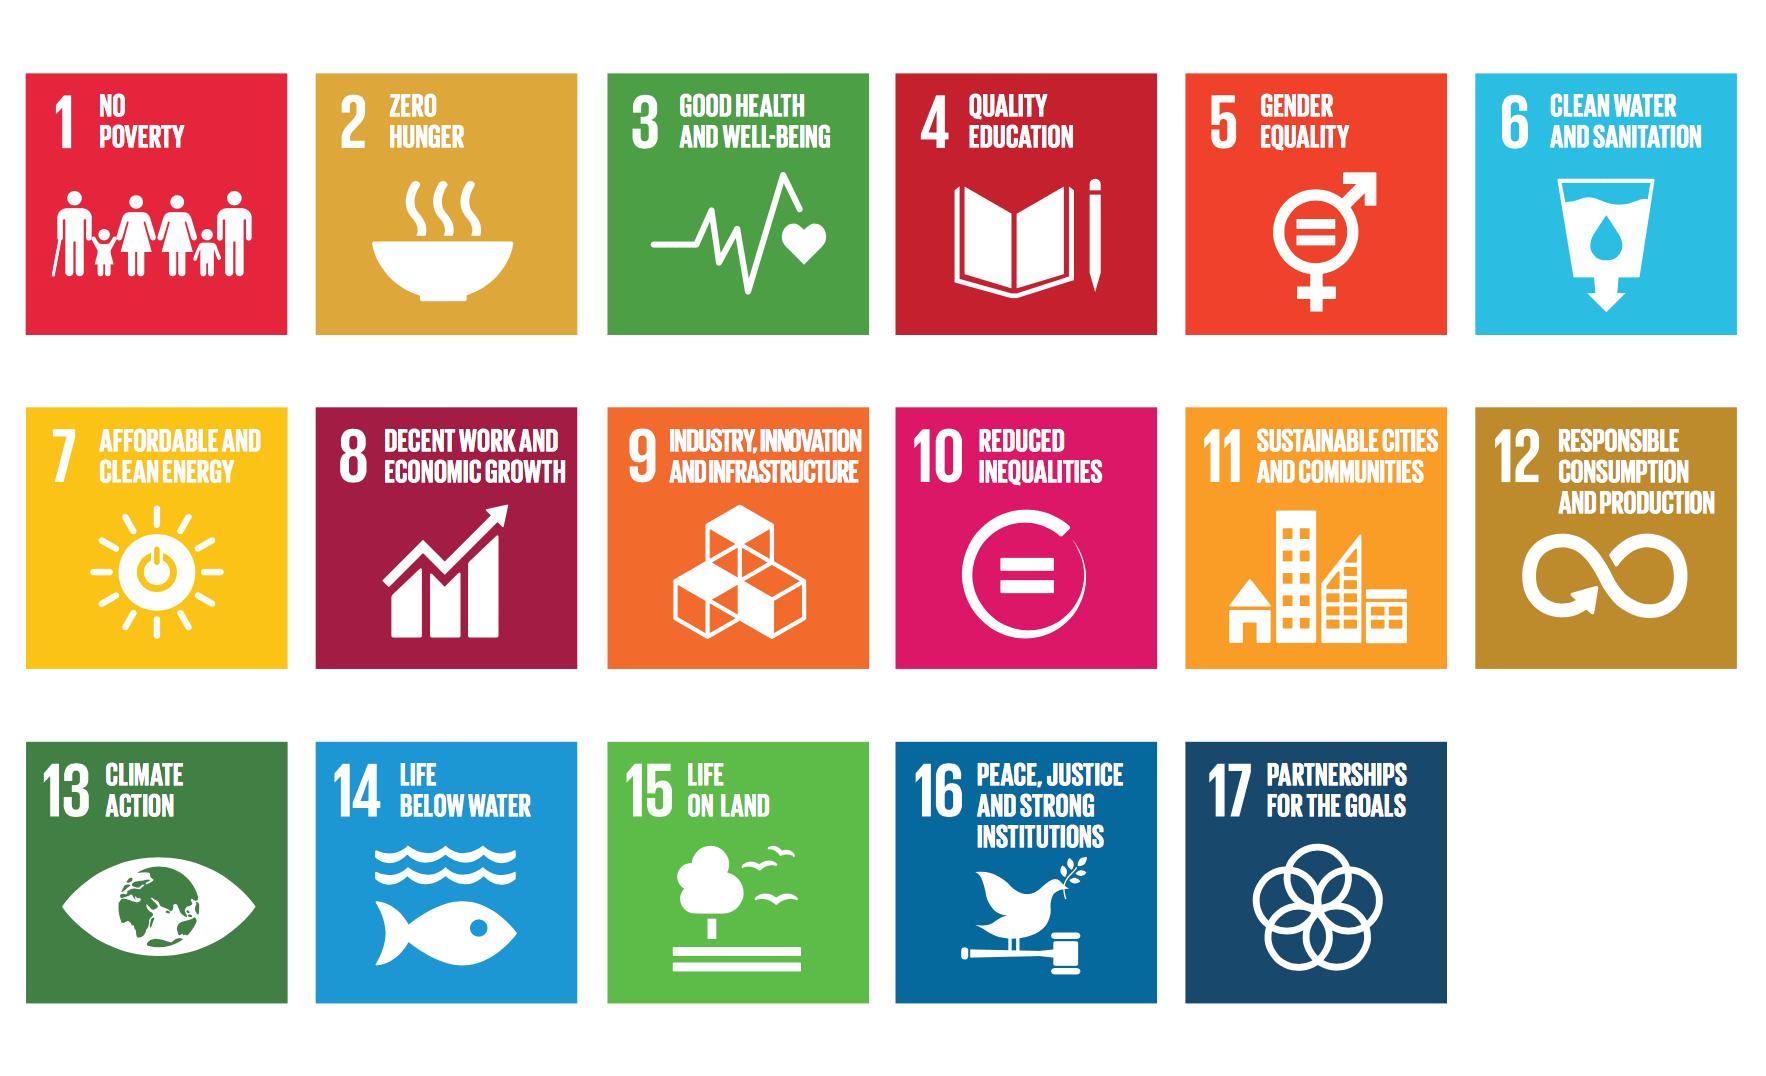 image:sdgs-sustainable-development-goals1.png